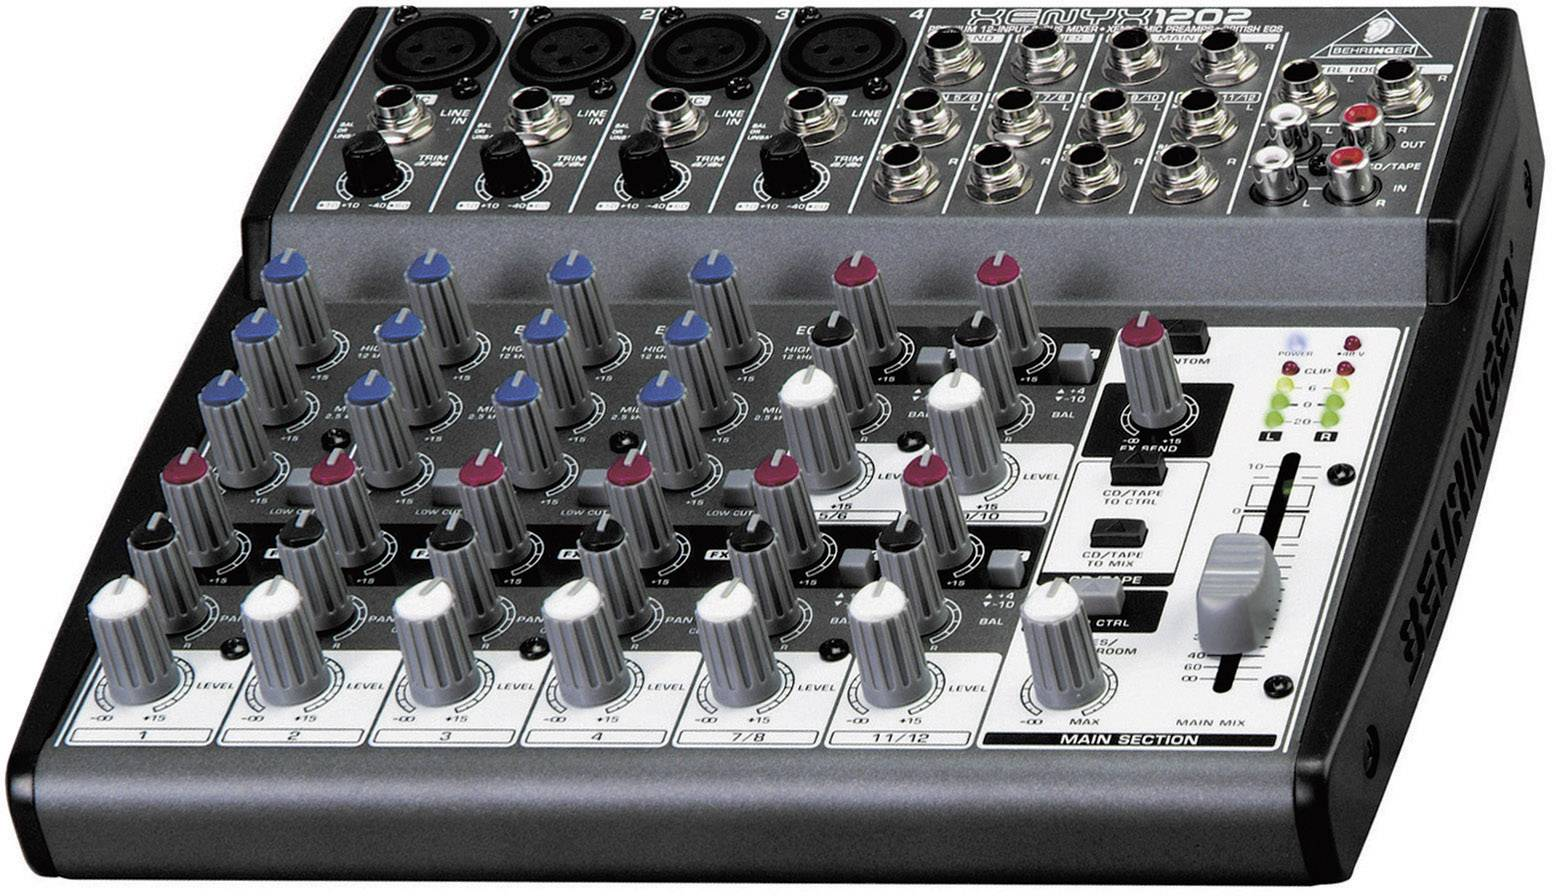 Mixážní pult Behringer Xenyx 1202